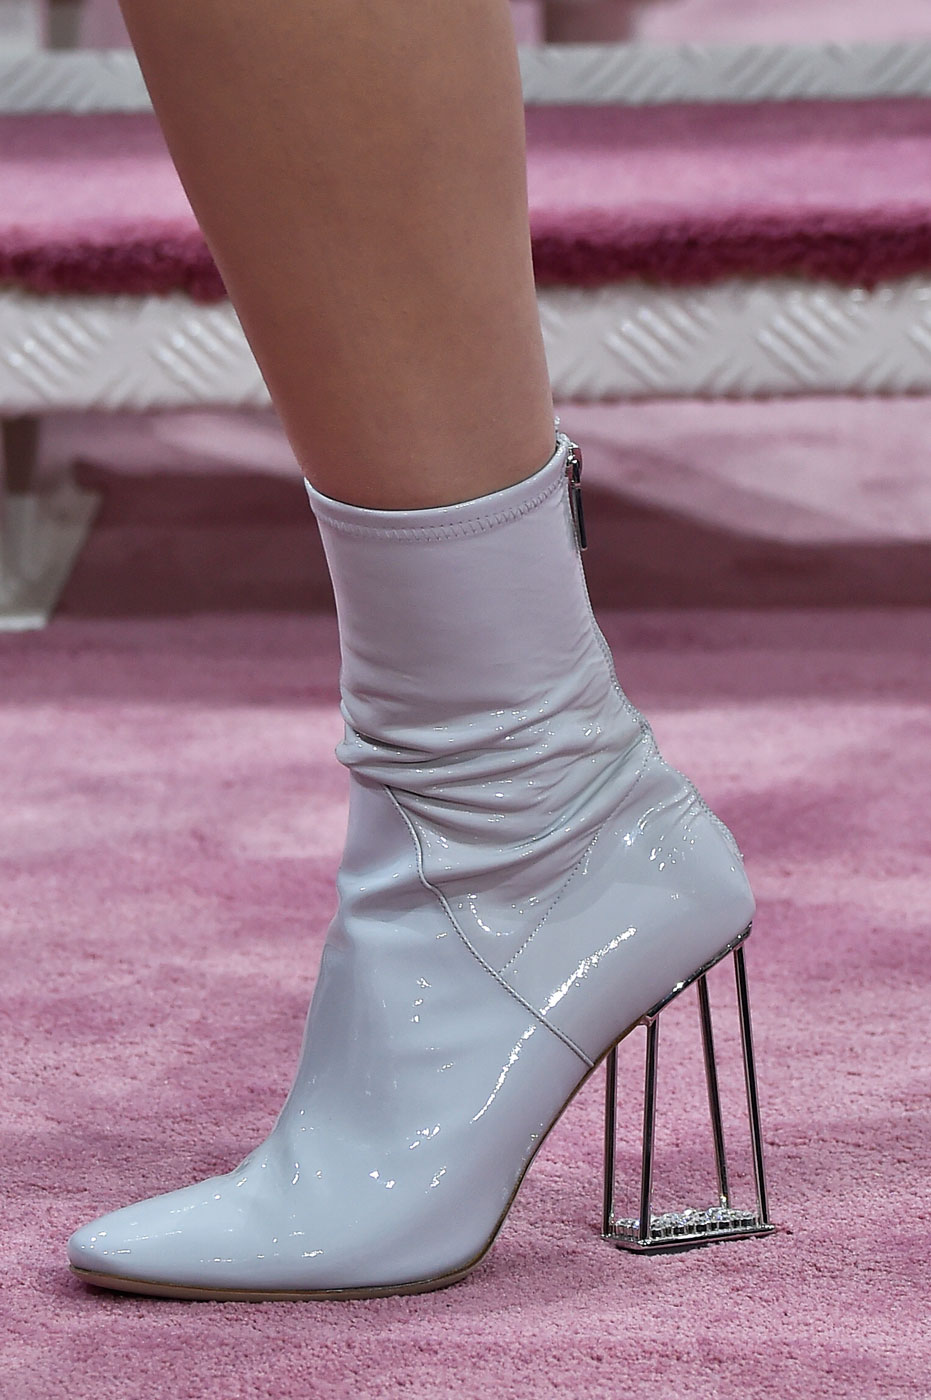 Christian-Dior-fashion-runway-show-close-ups-haute-couture-paris-spring-summer-2015-the-impression-169